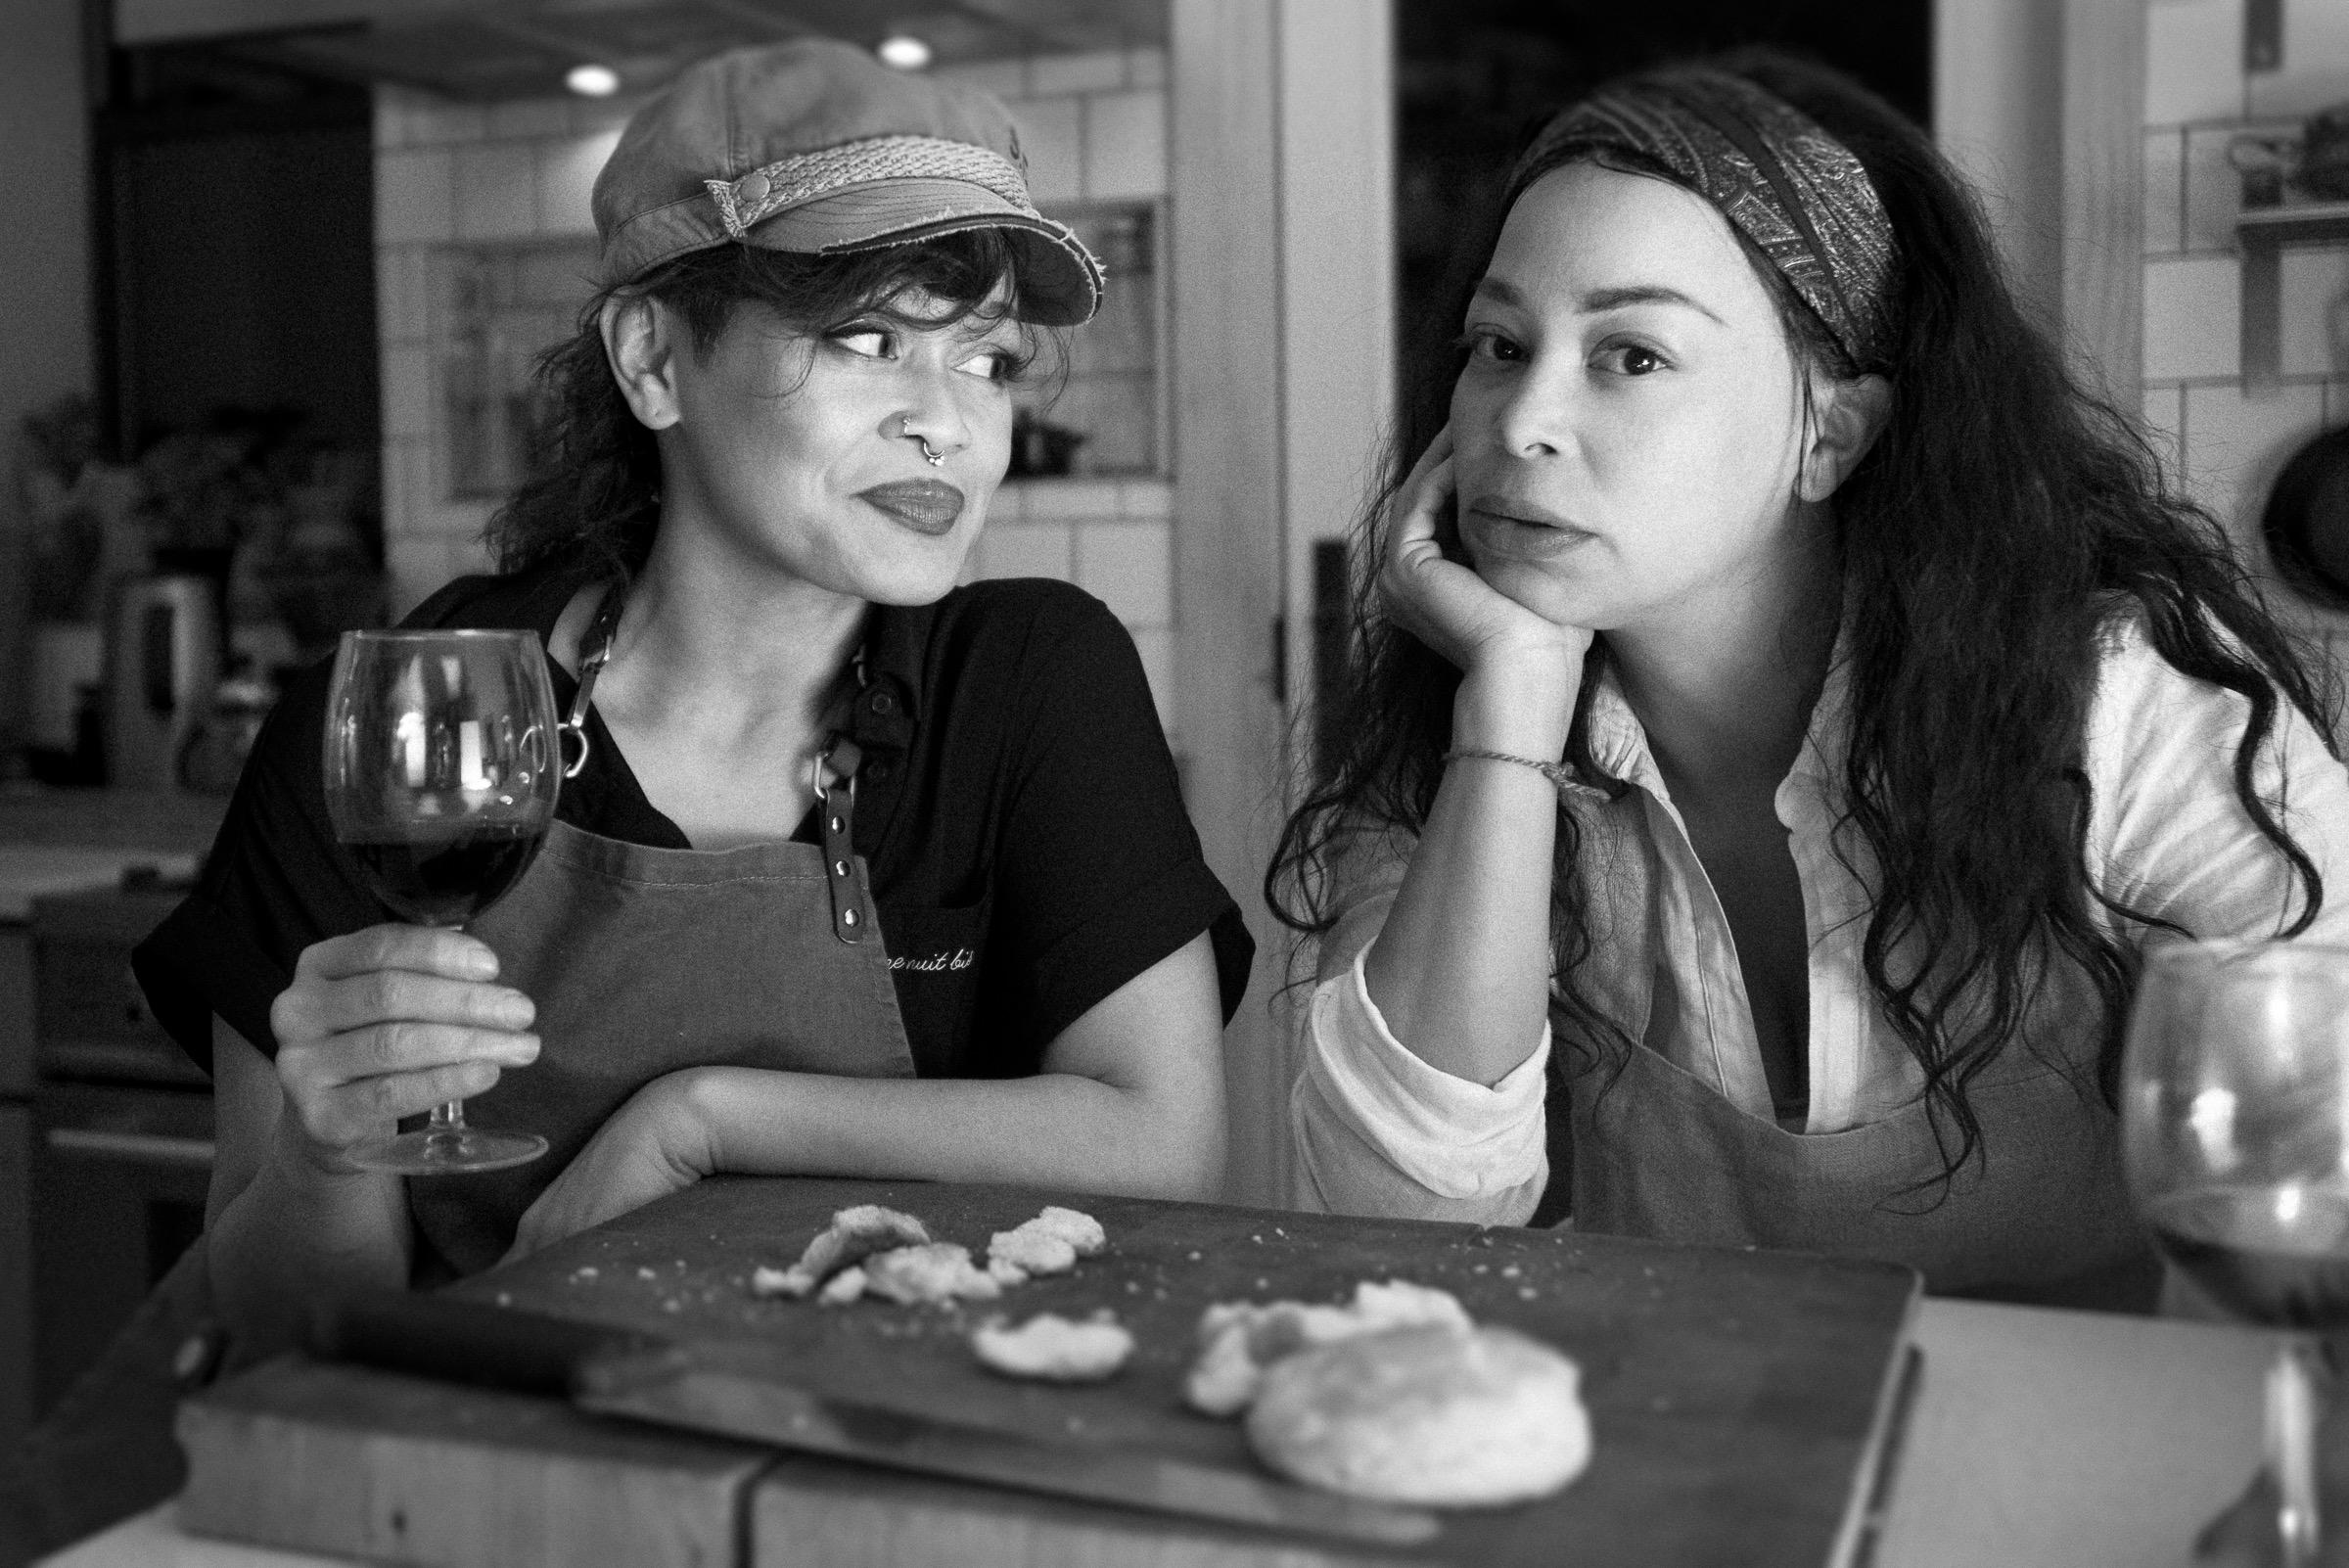 Chefs Miranti and Diavanna